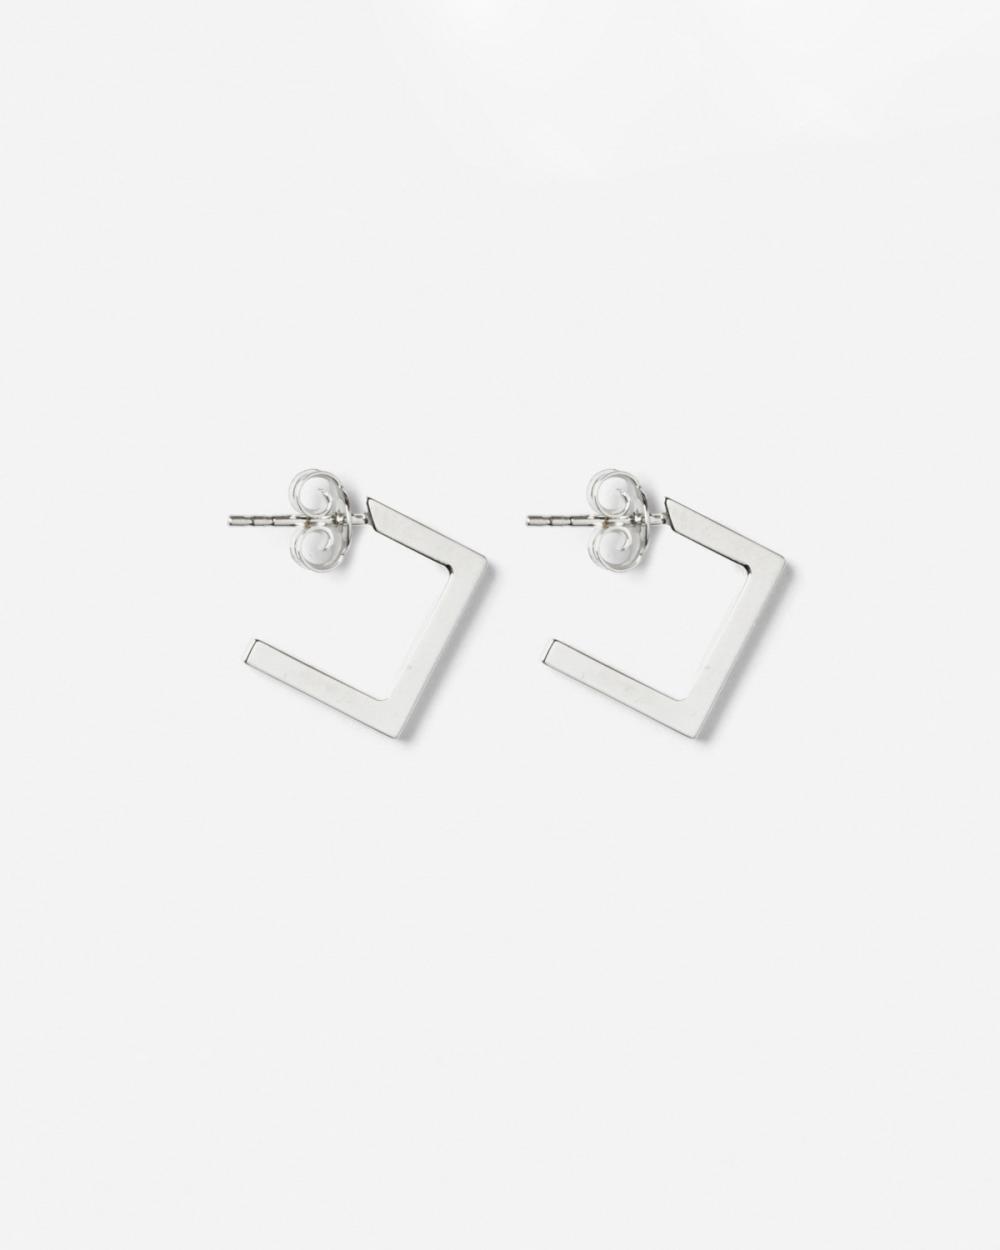 Earrings SILVER RHOMBUS PLATE SMALL EARRINGS NOVE25